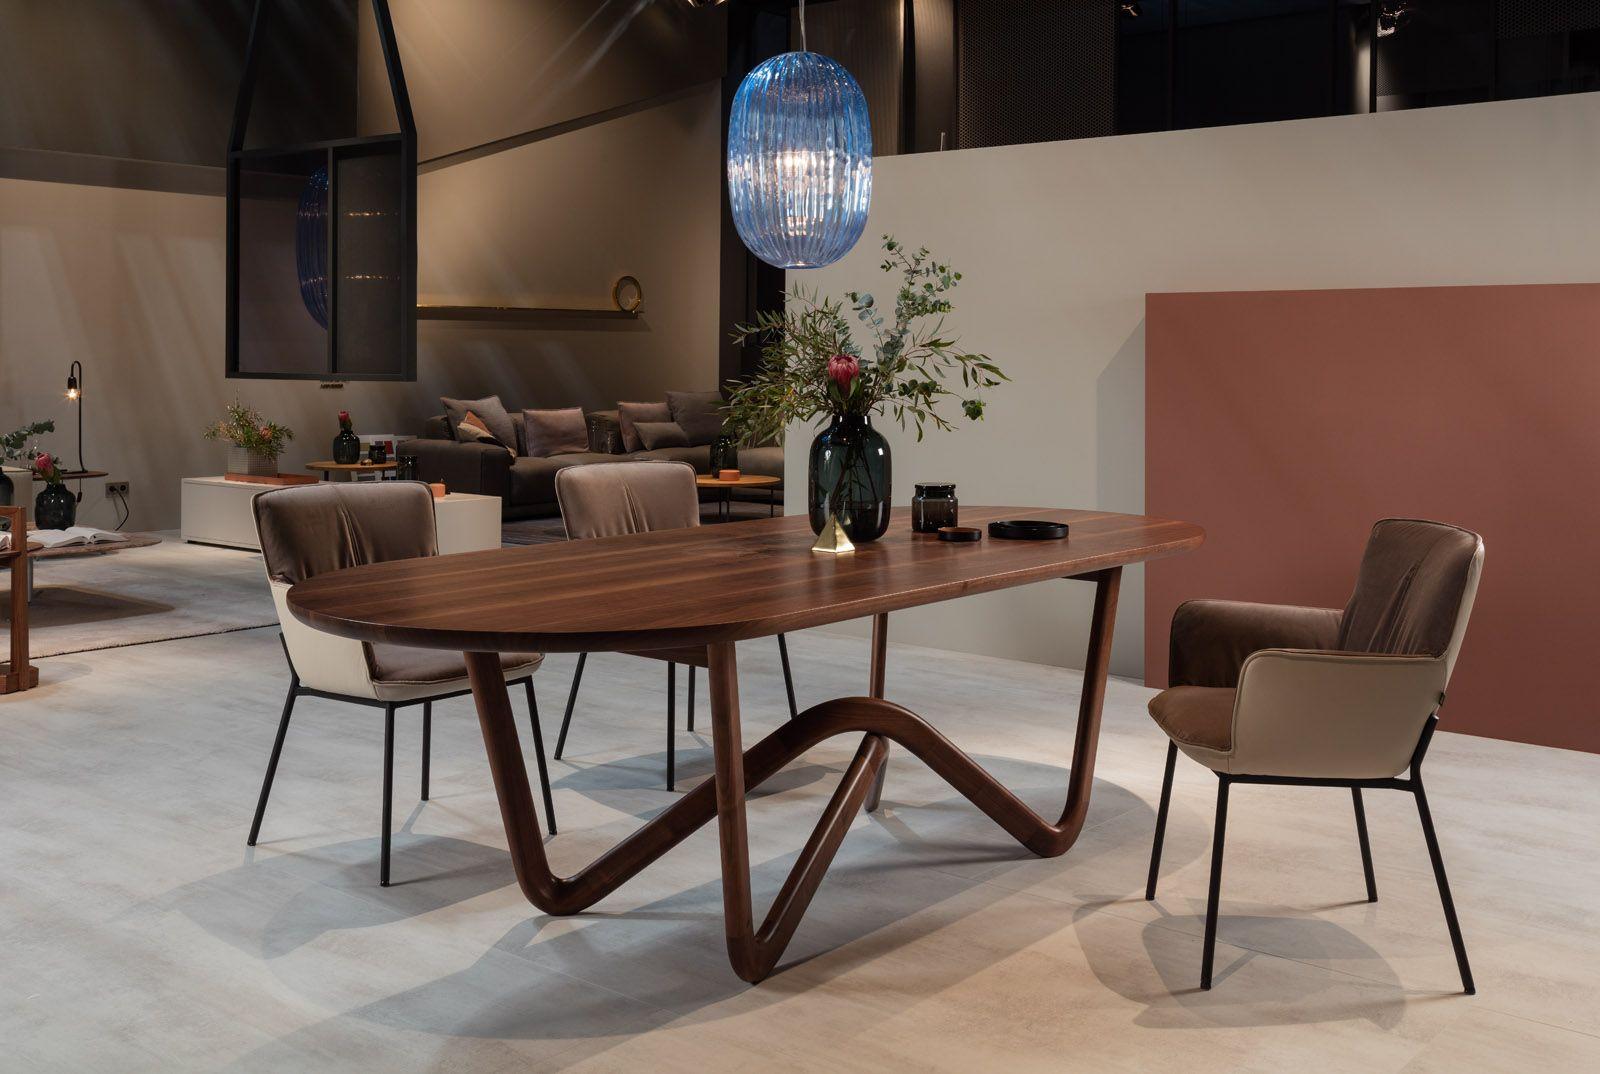 Rolf Benz 988 Combines Nature Art Culture And Architecture Luxury Design Table Art Luxuryfurniture Interior Luxury Furniture Home Decor Interior